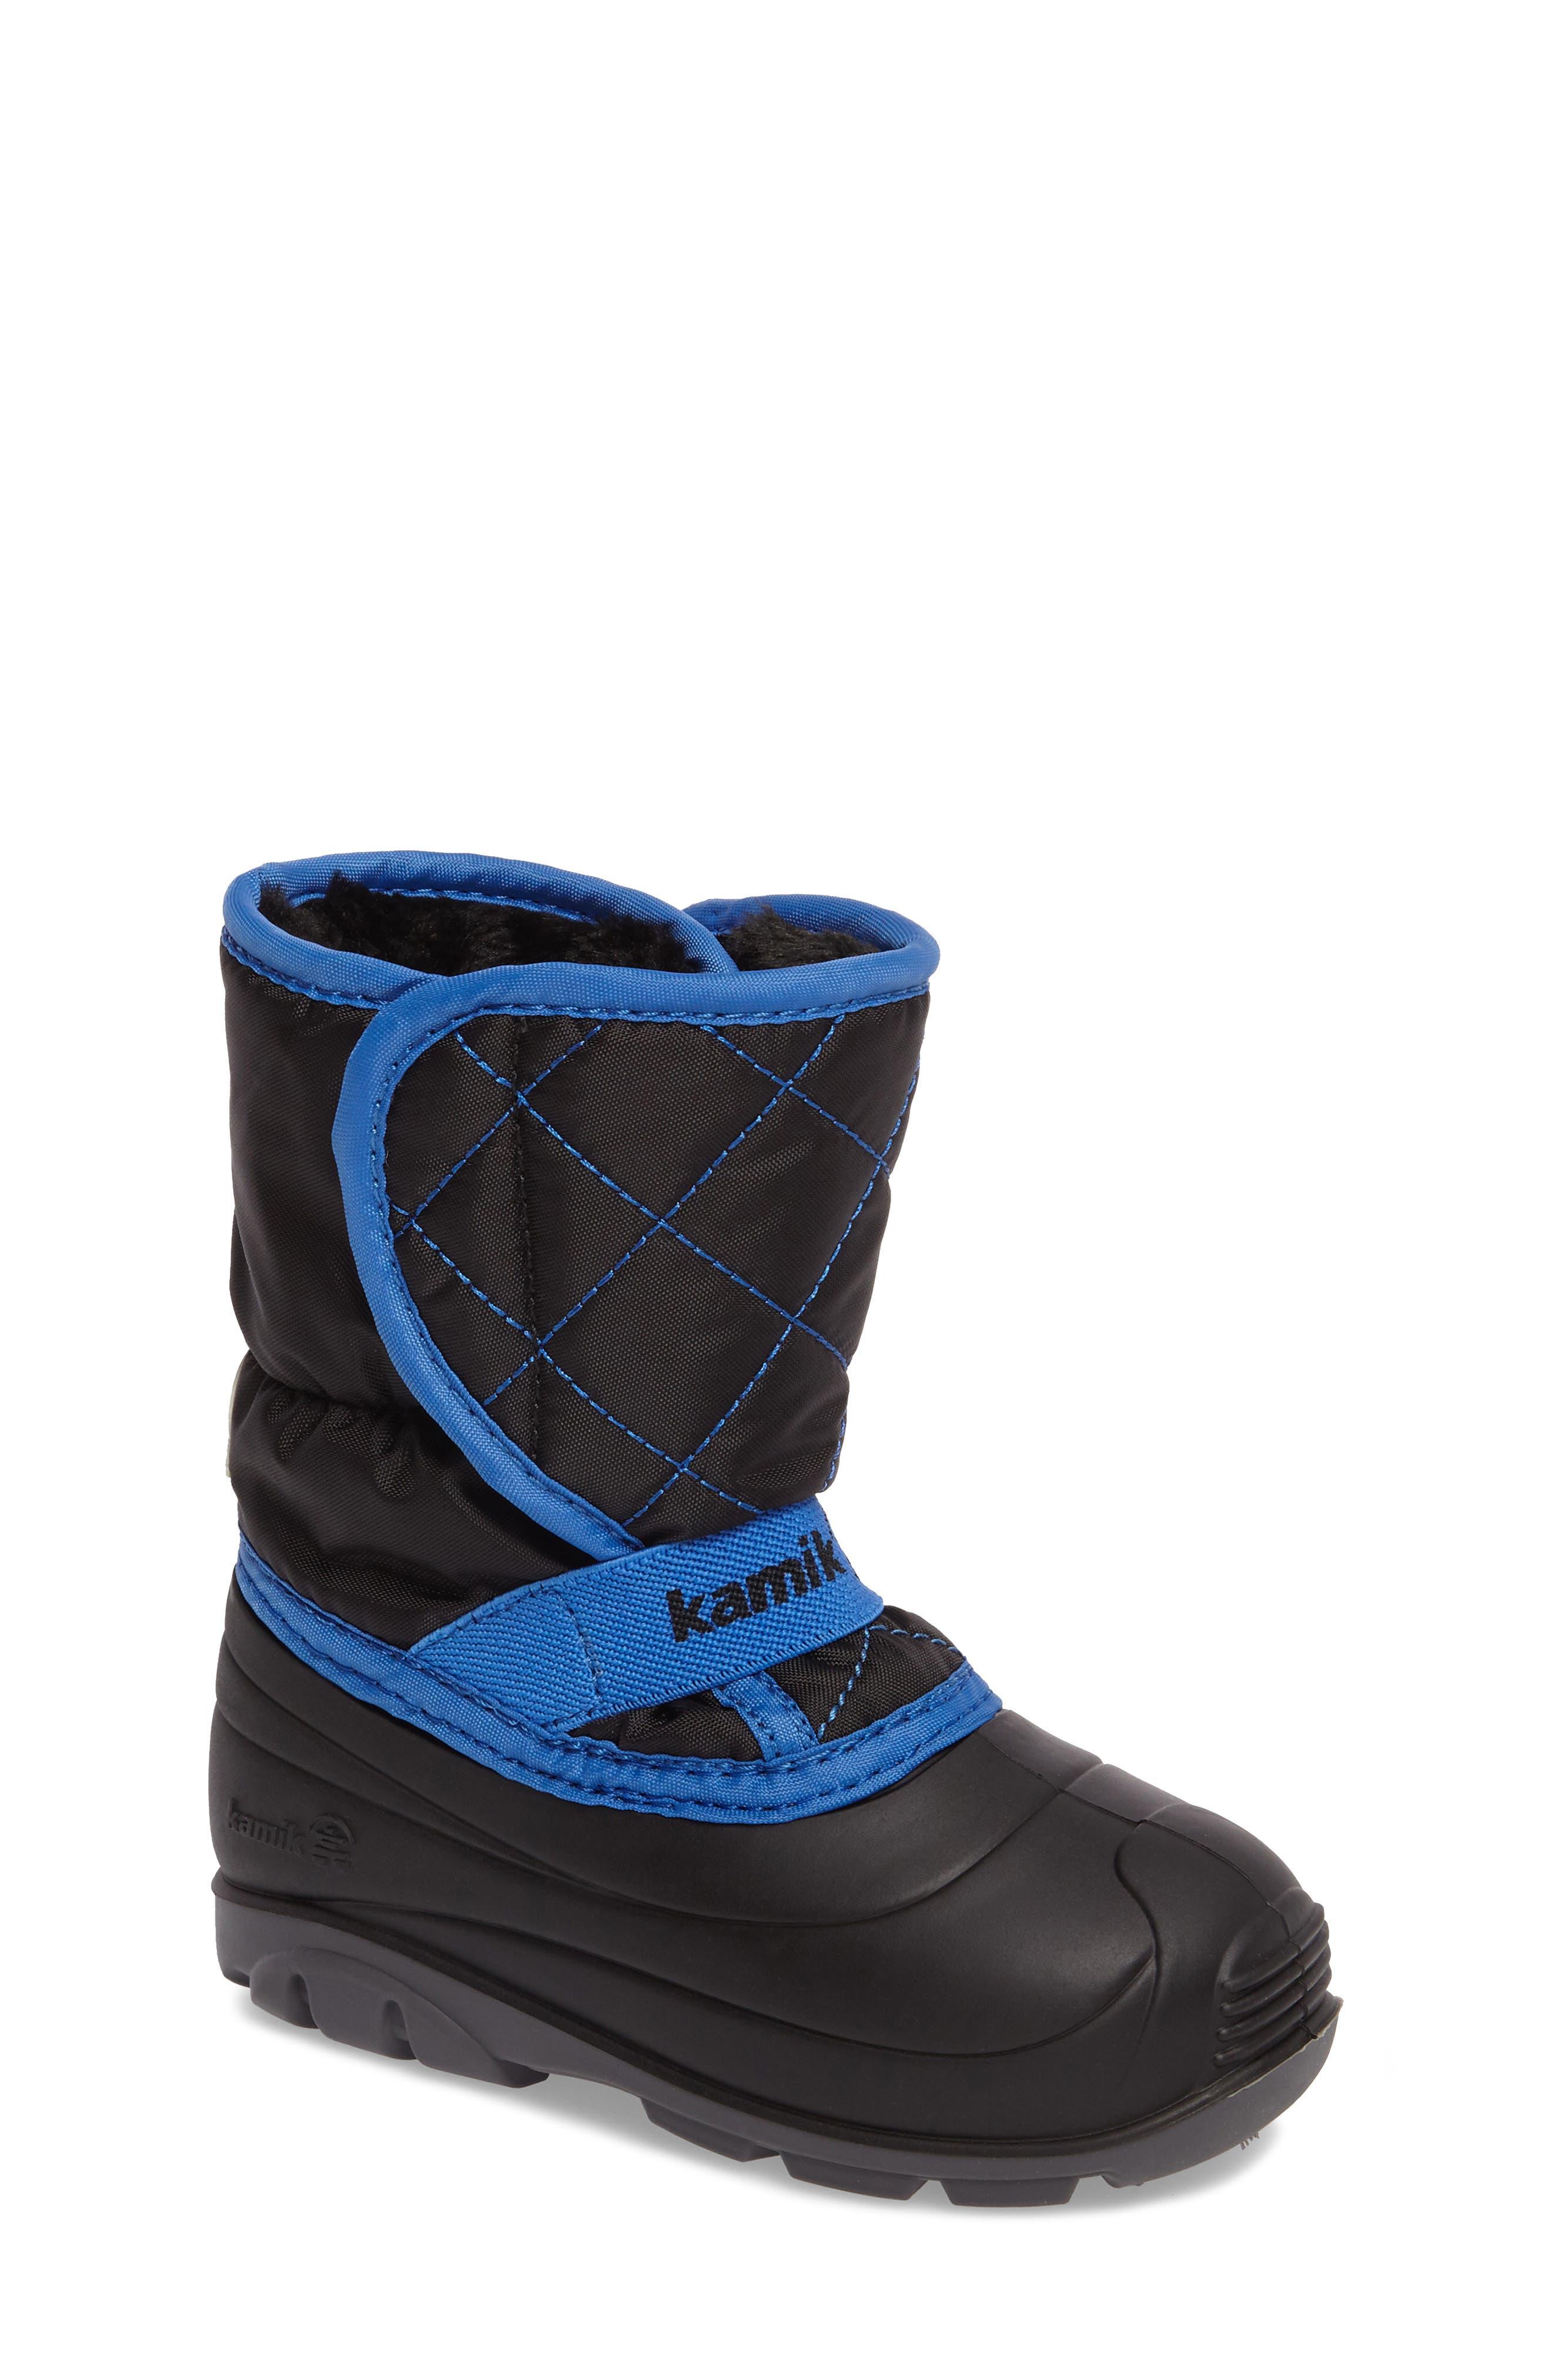 Kamik Pika2 Faux Fur Insulated Waterproof Snow Boot (Walker & Toddler)